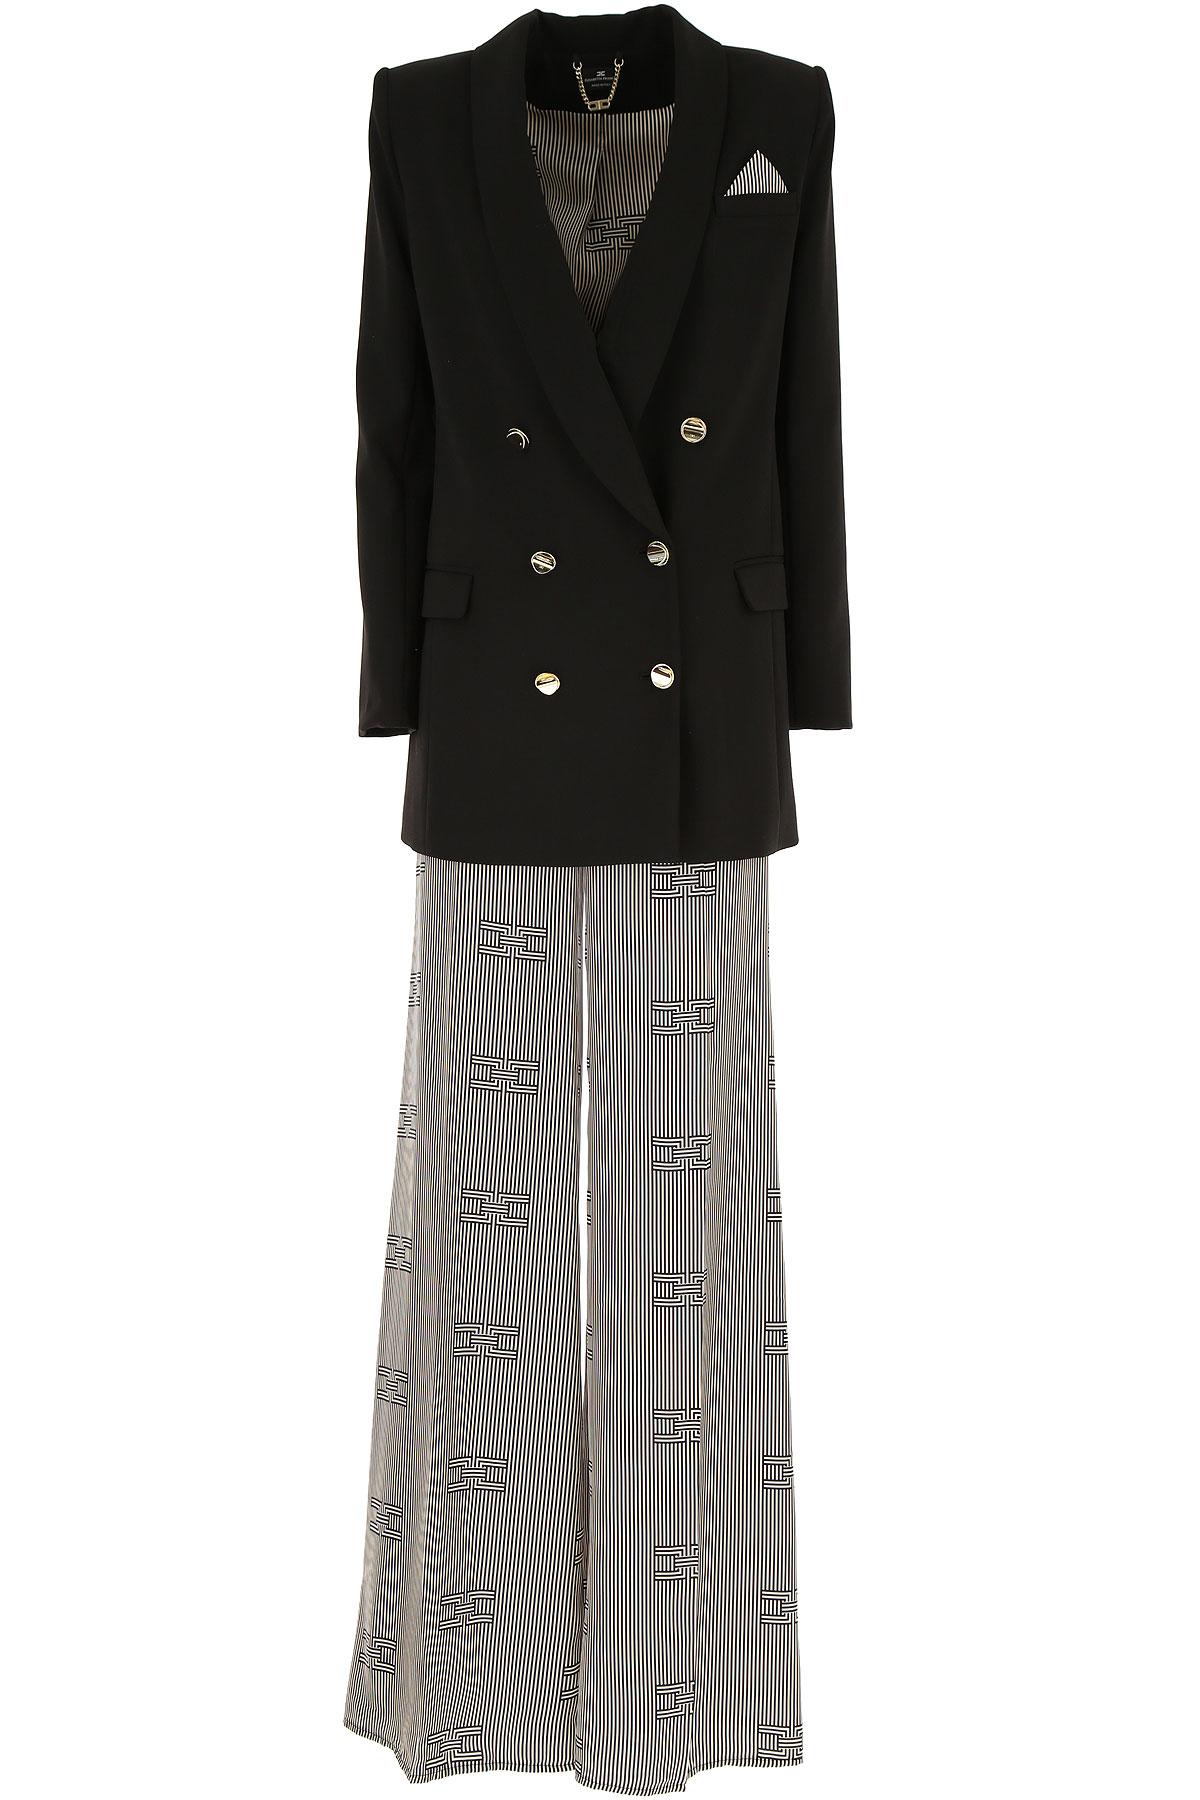 Elisabetta Franchi Blazer for Women On Sale, Black, polyester, 2019, 4 6